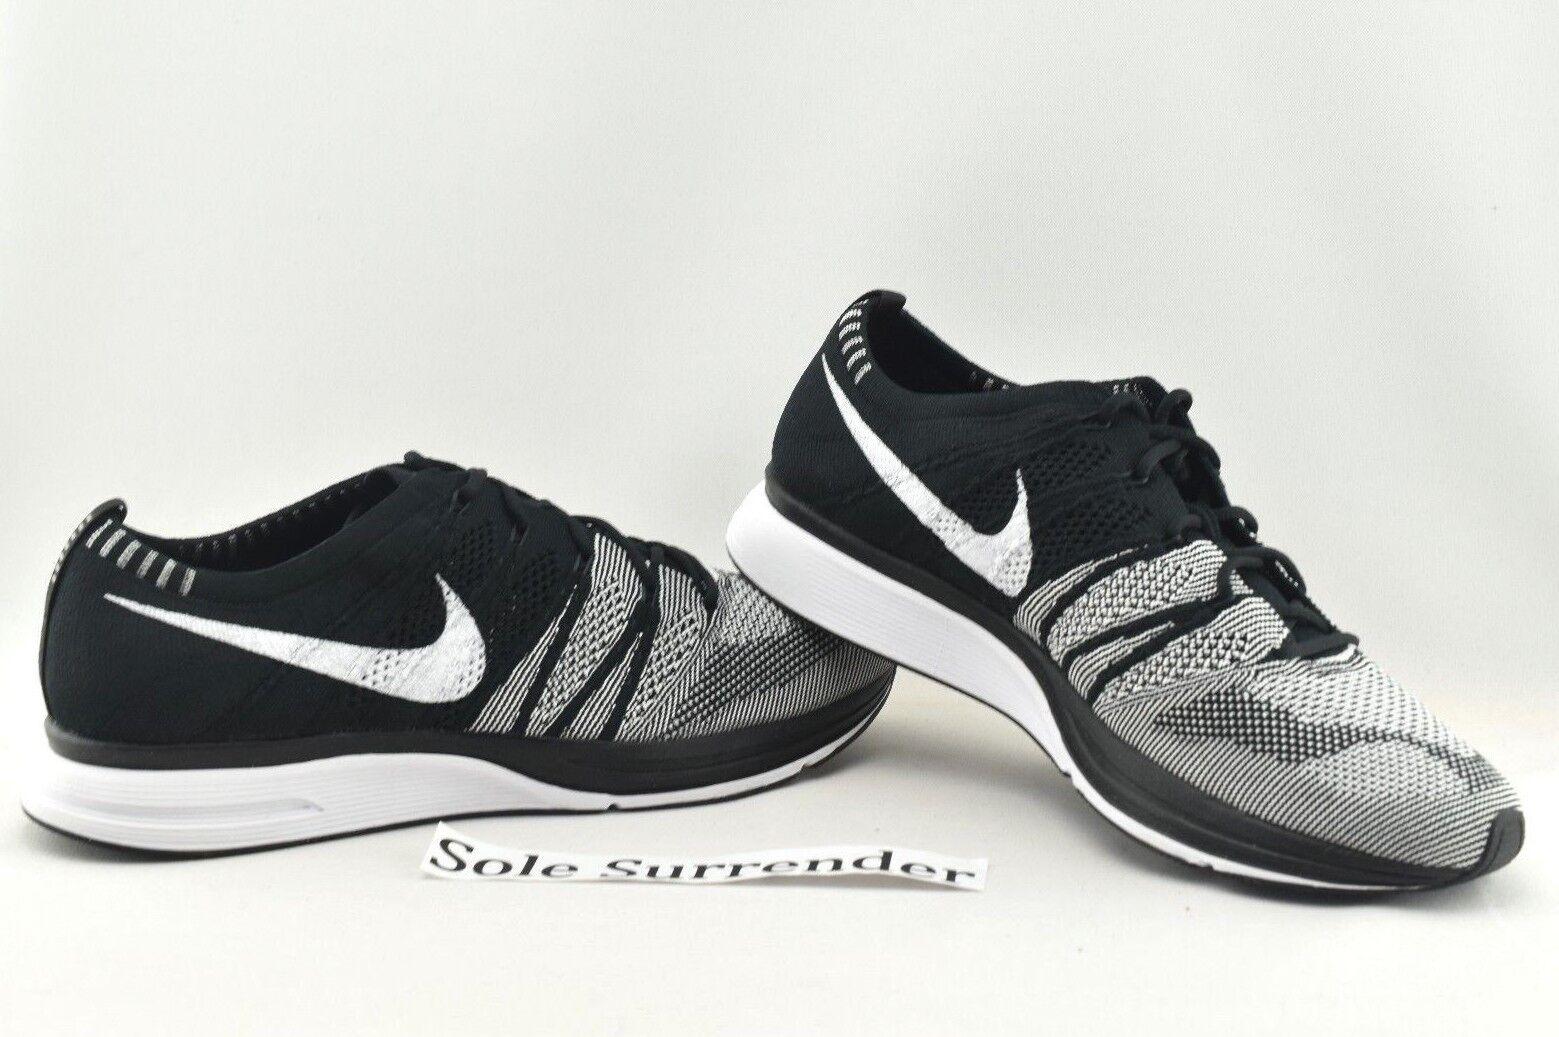 newest 24b4b acbe1 Nike Flyknit Flyknit Flyknit Trainer tamaño 11 Nuevo ah8396-005 Oreo og  Blanco Negro Racer